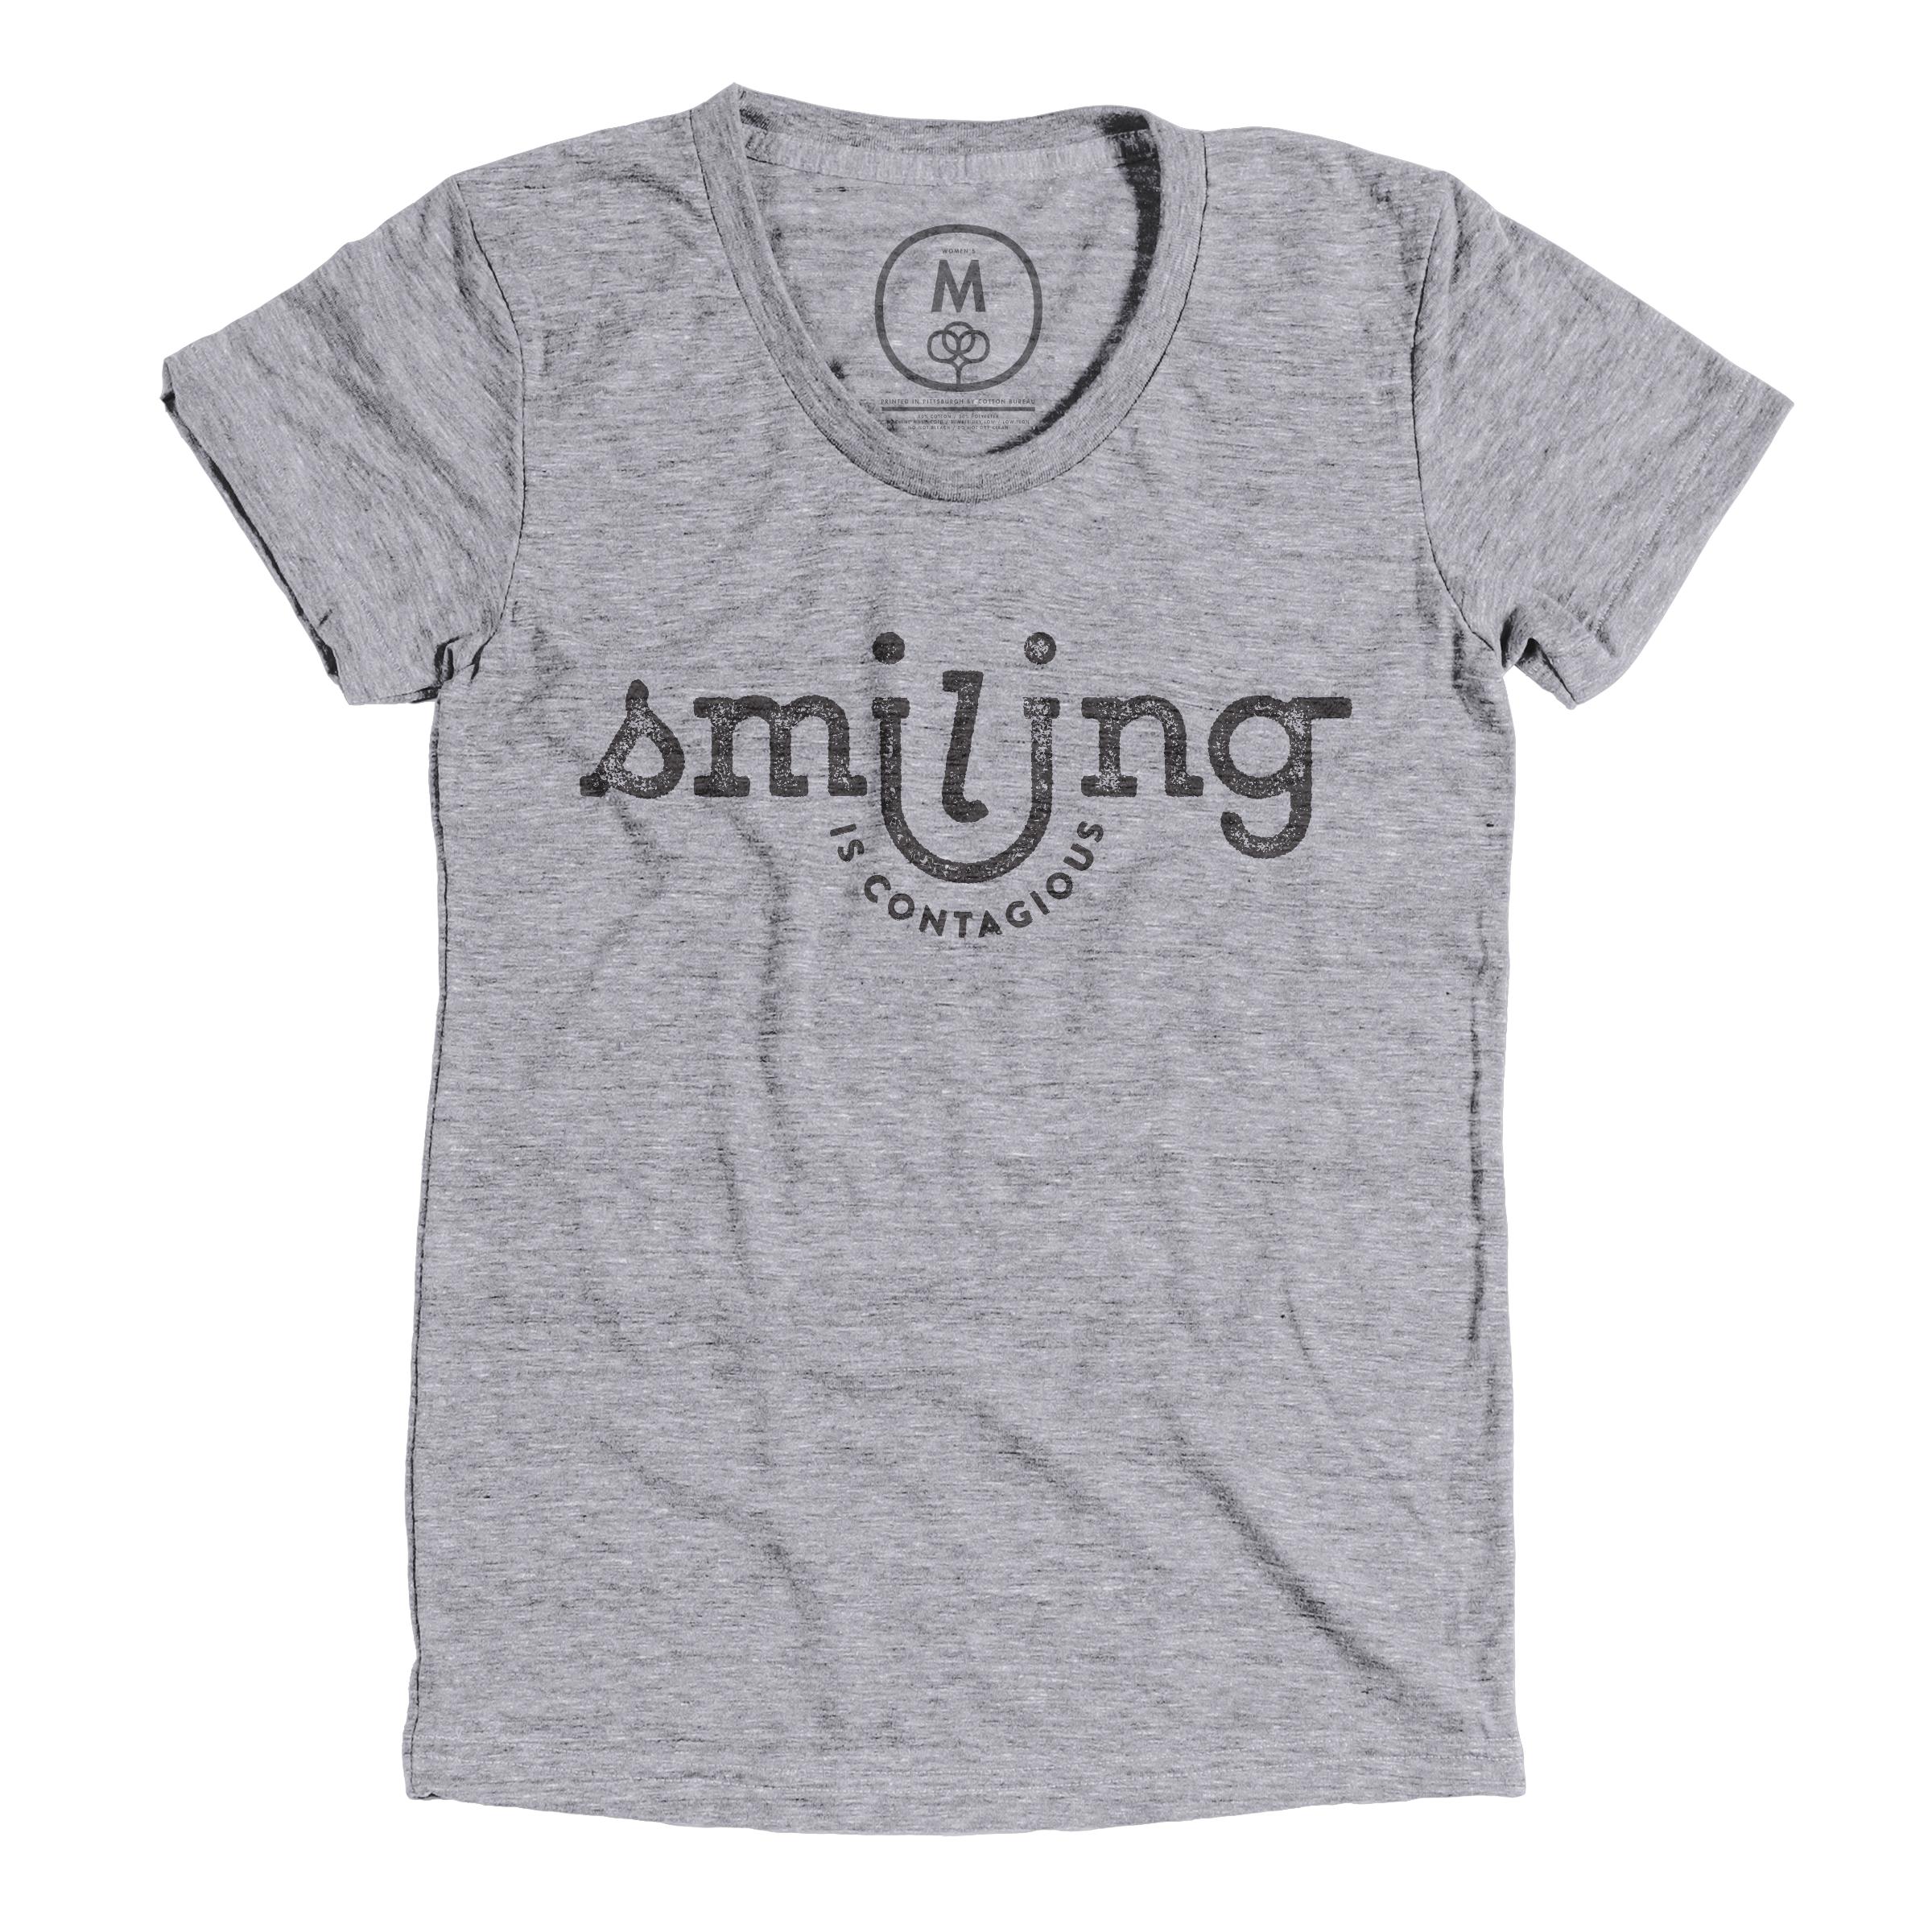 Smiling Is Contagious Premium Heather (Women's)